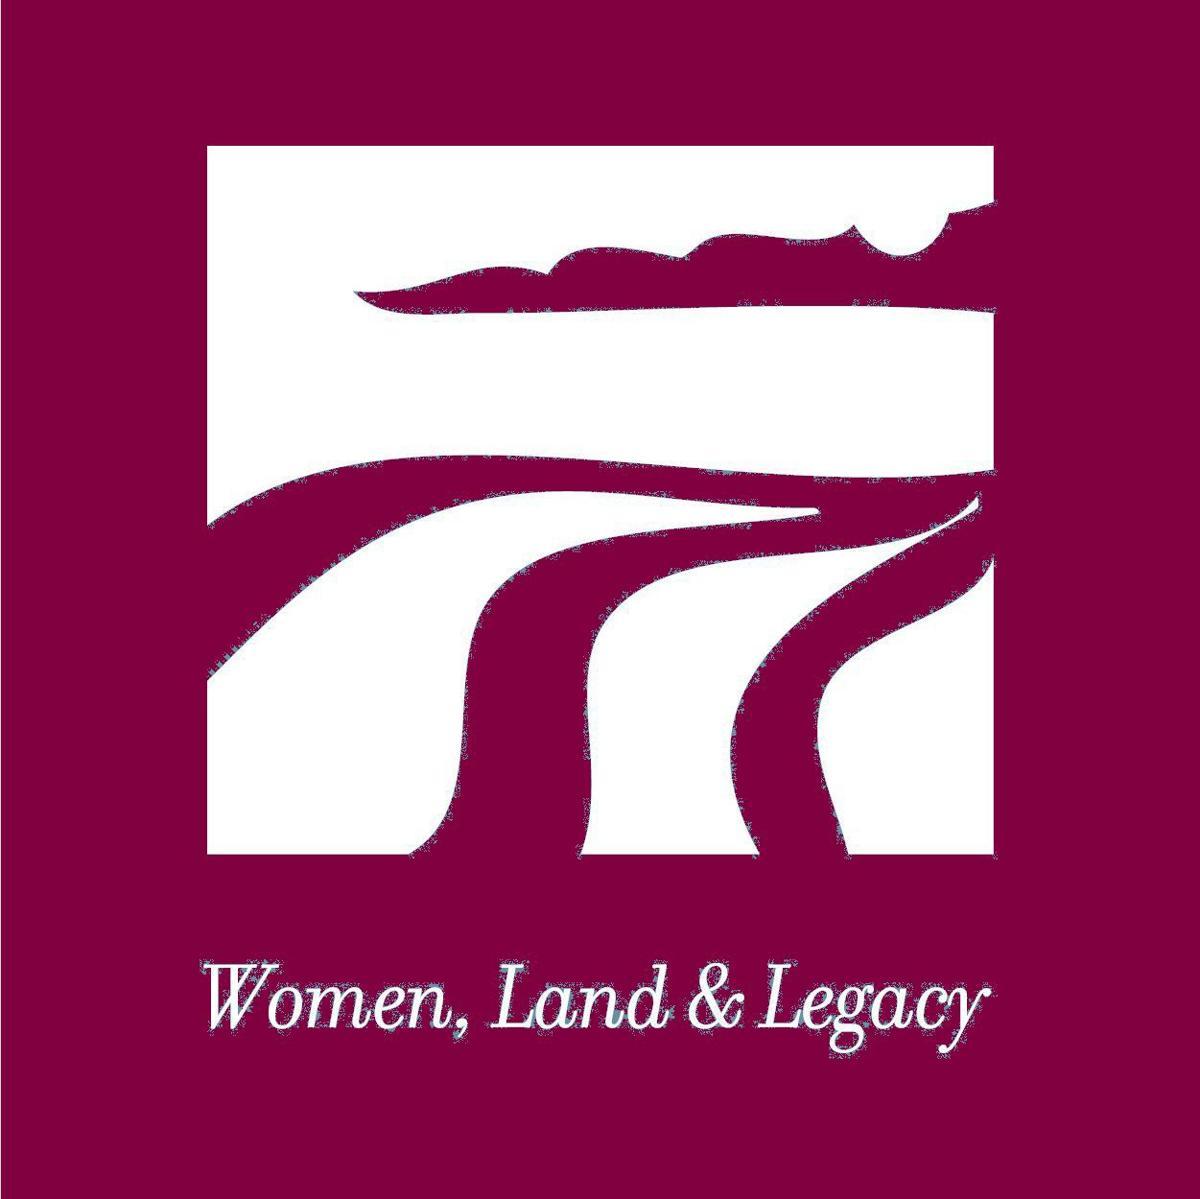 Women, Land & Legacy